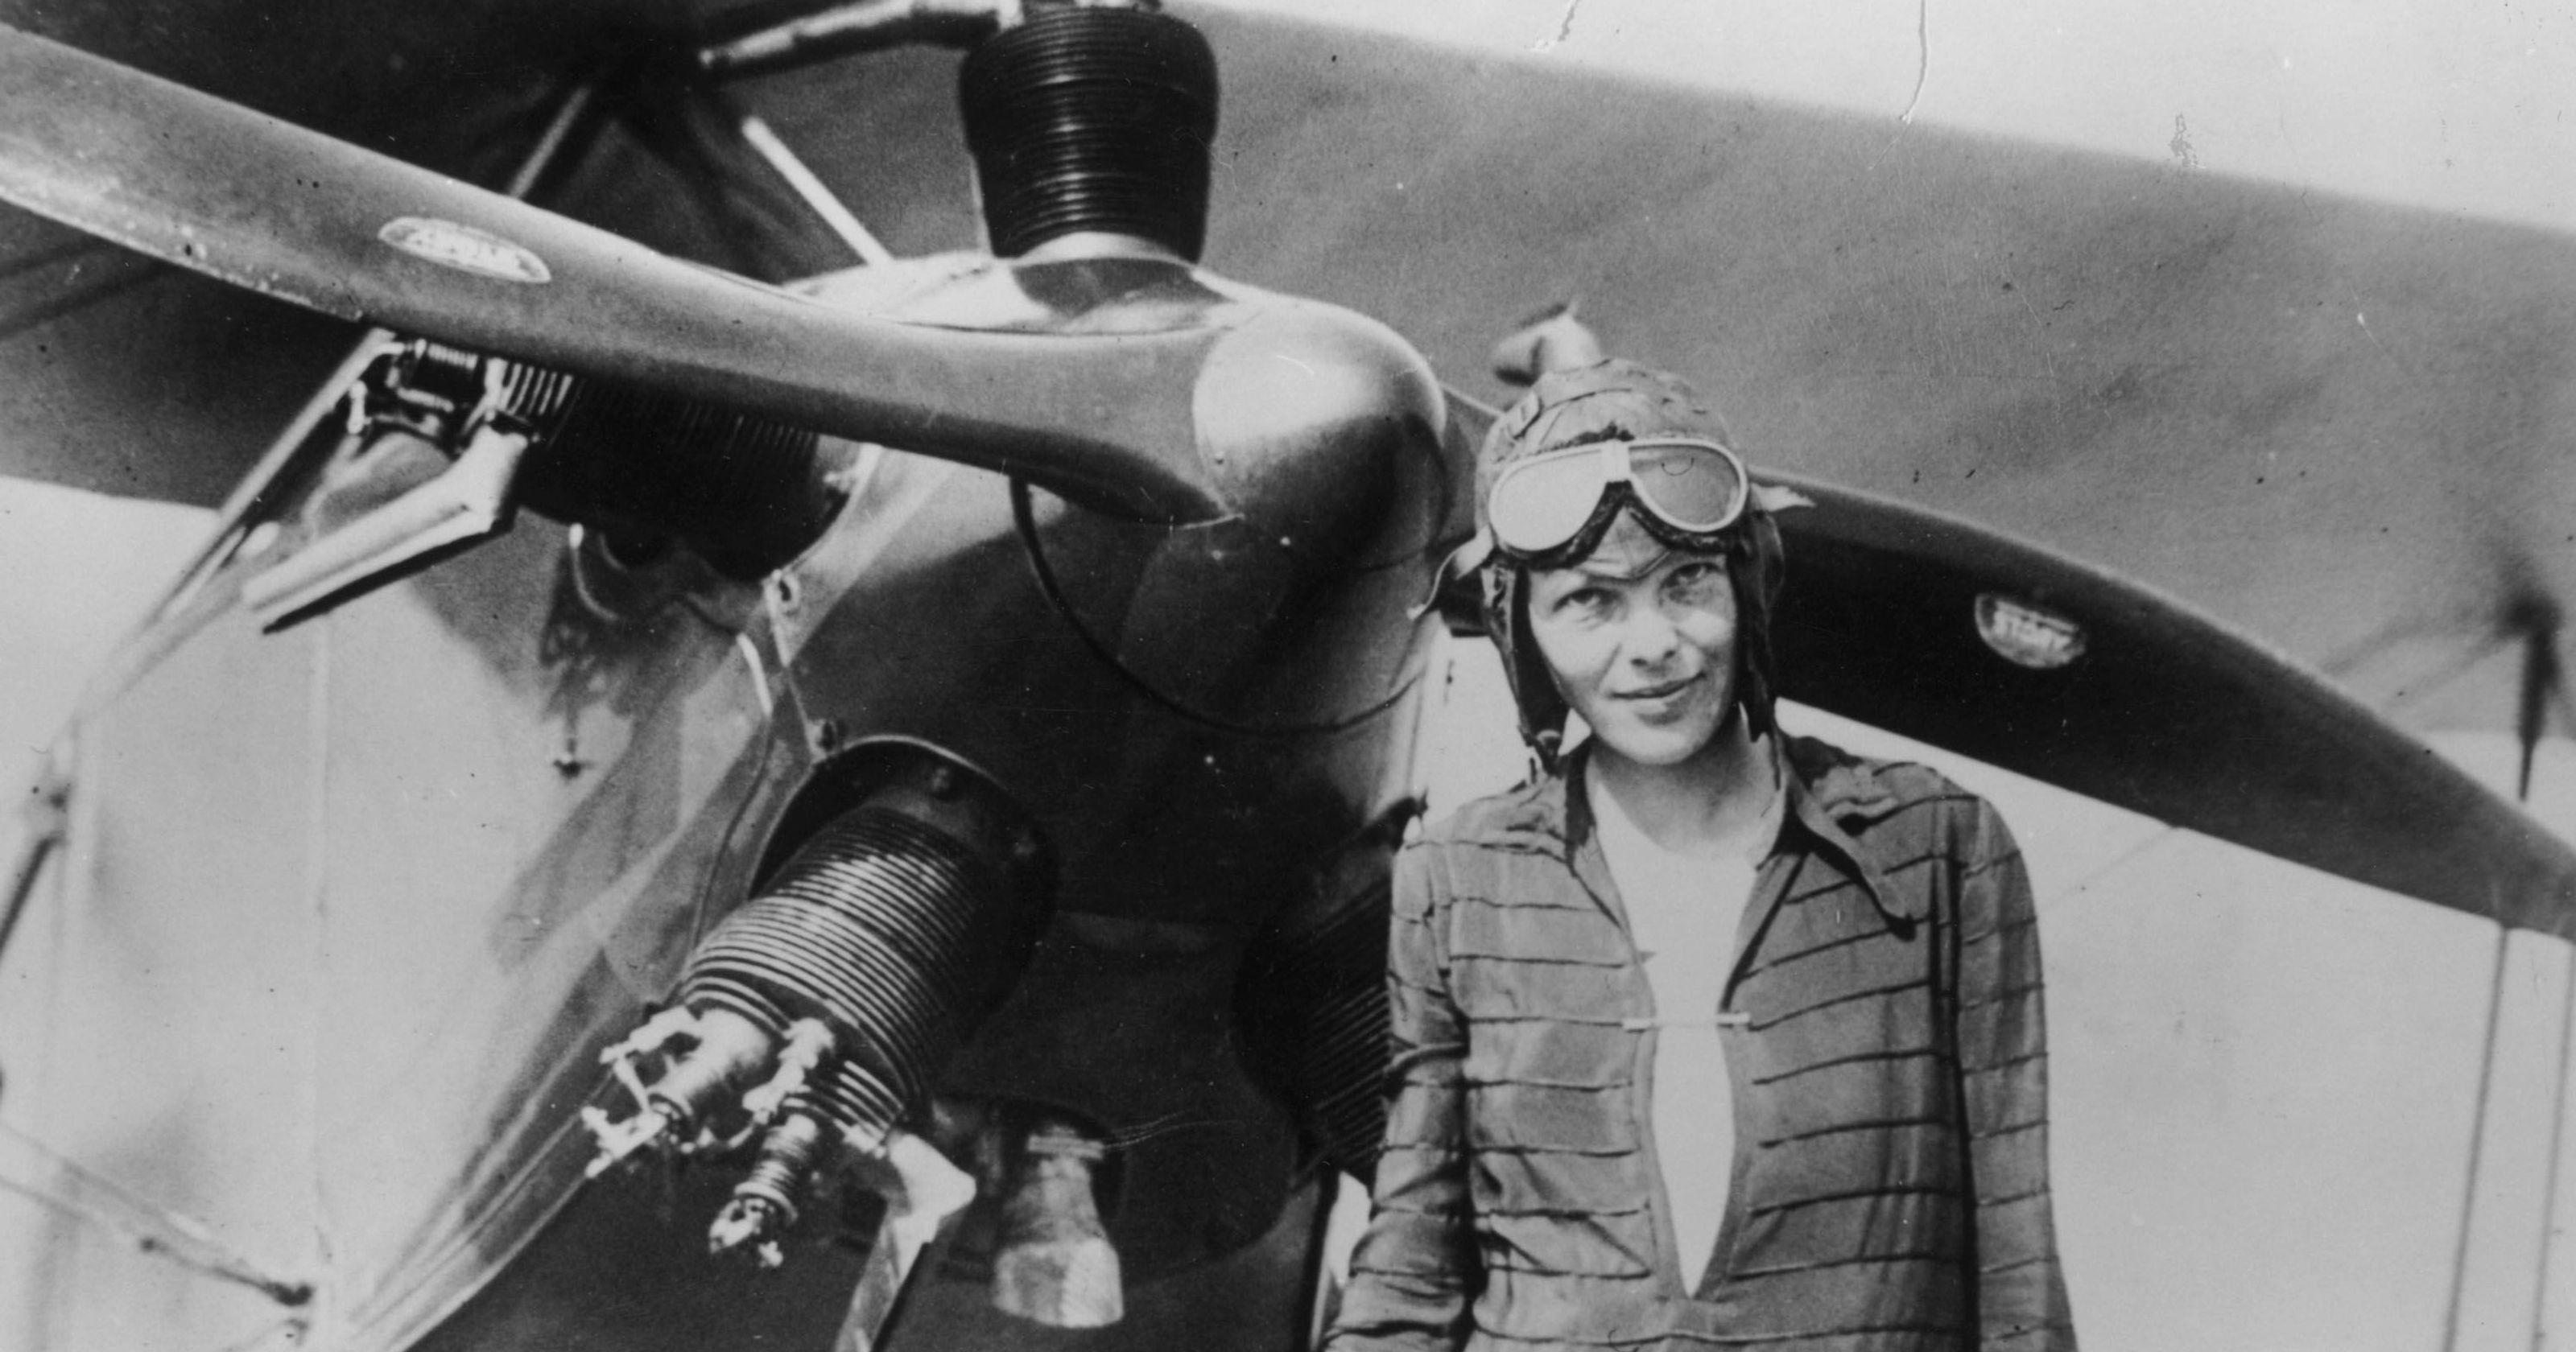 Distress call analysis released on aviator's birthday